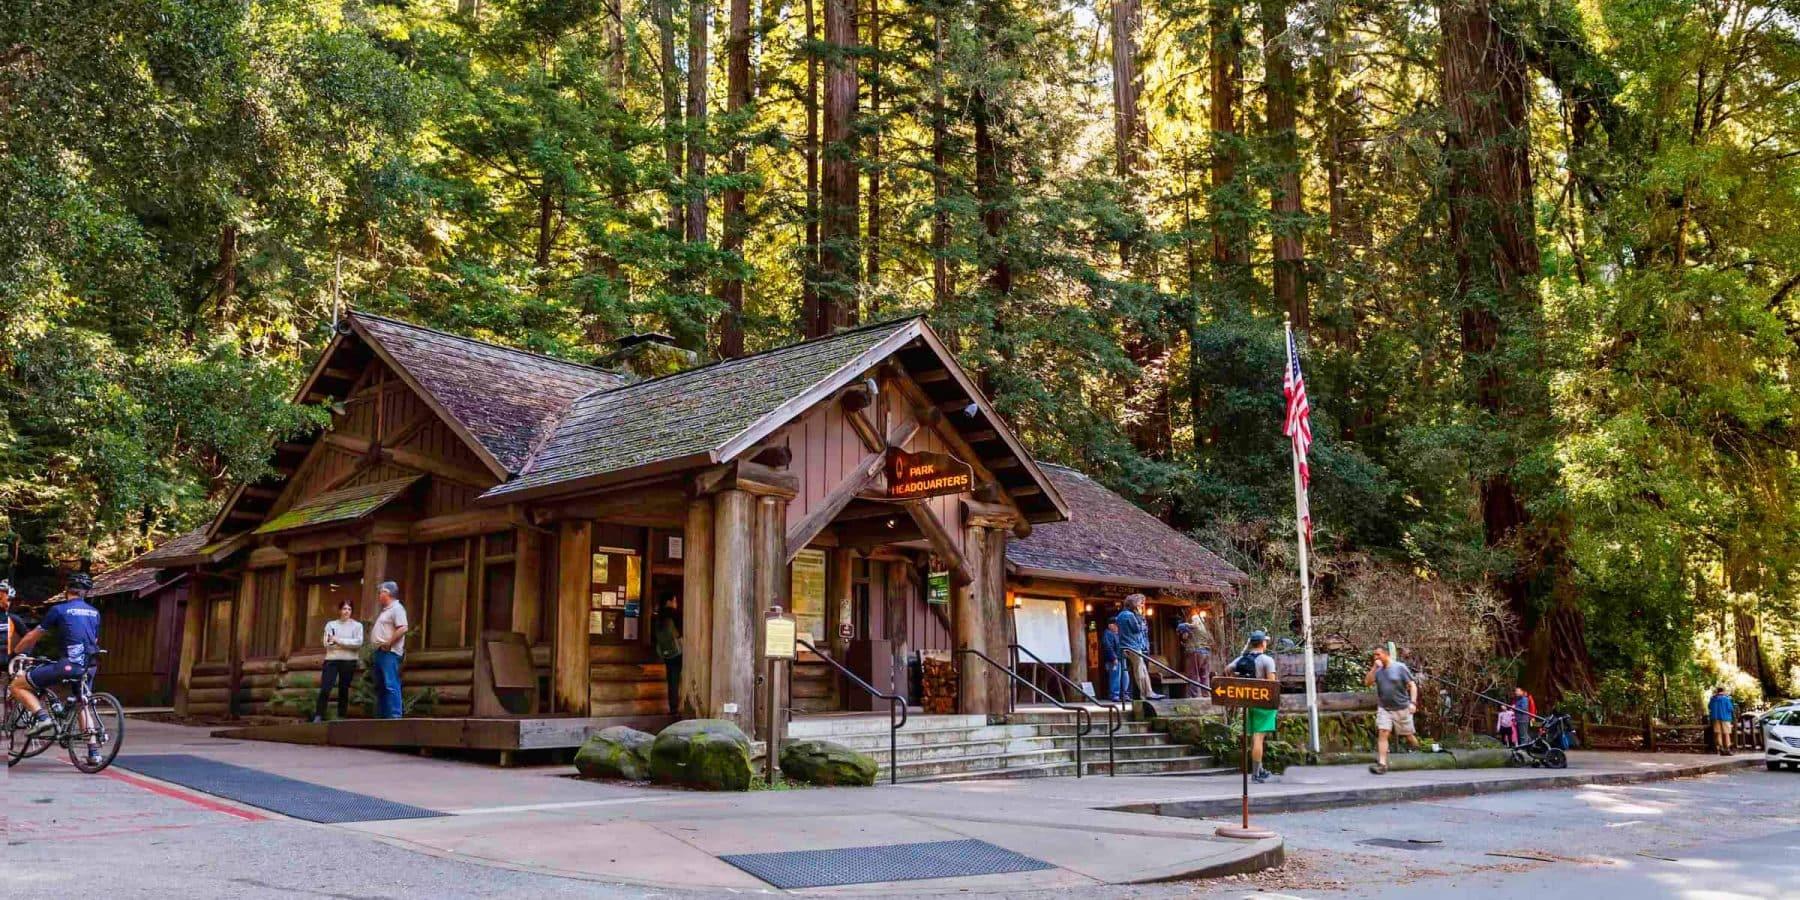 Lodge at Big Basin Redwoods State Park